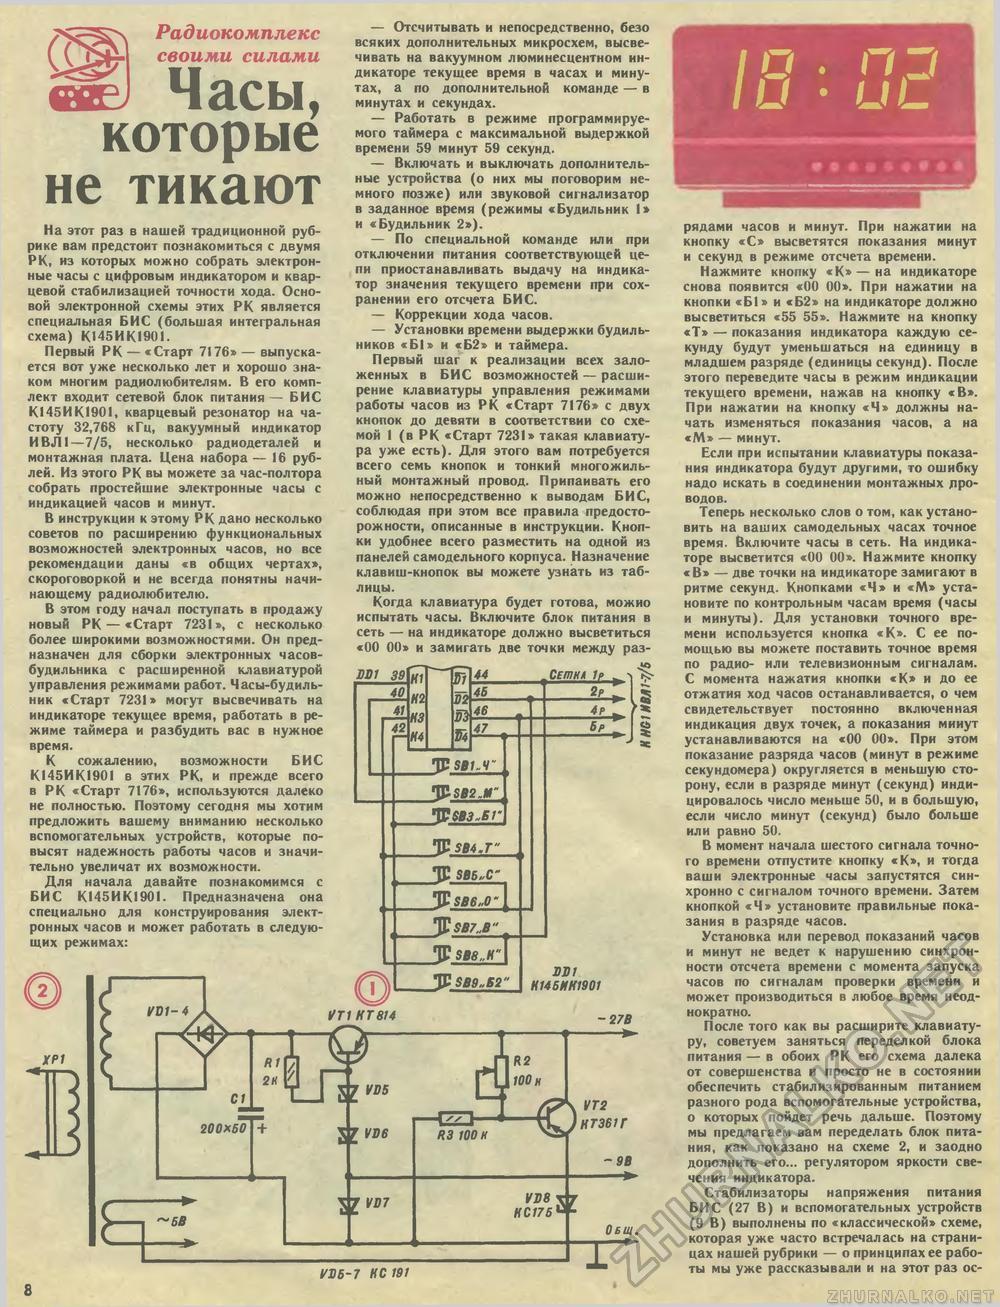 Схема простых электронных часов - cb-krik.ru